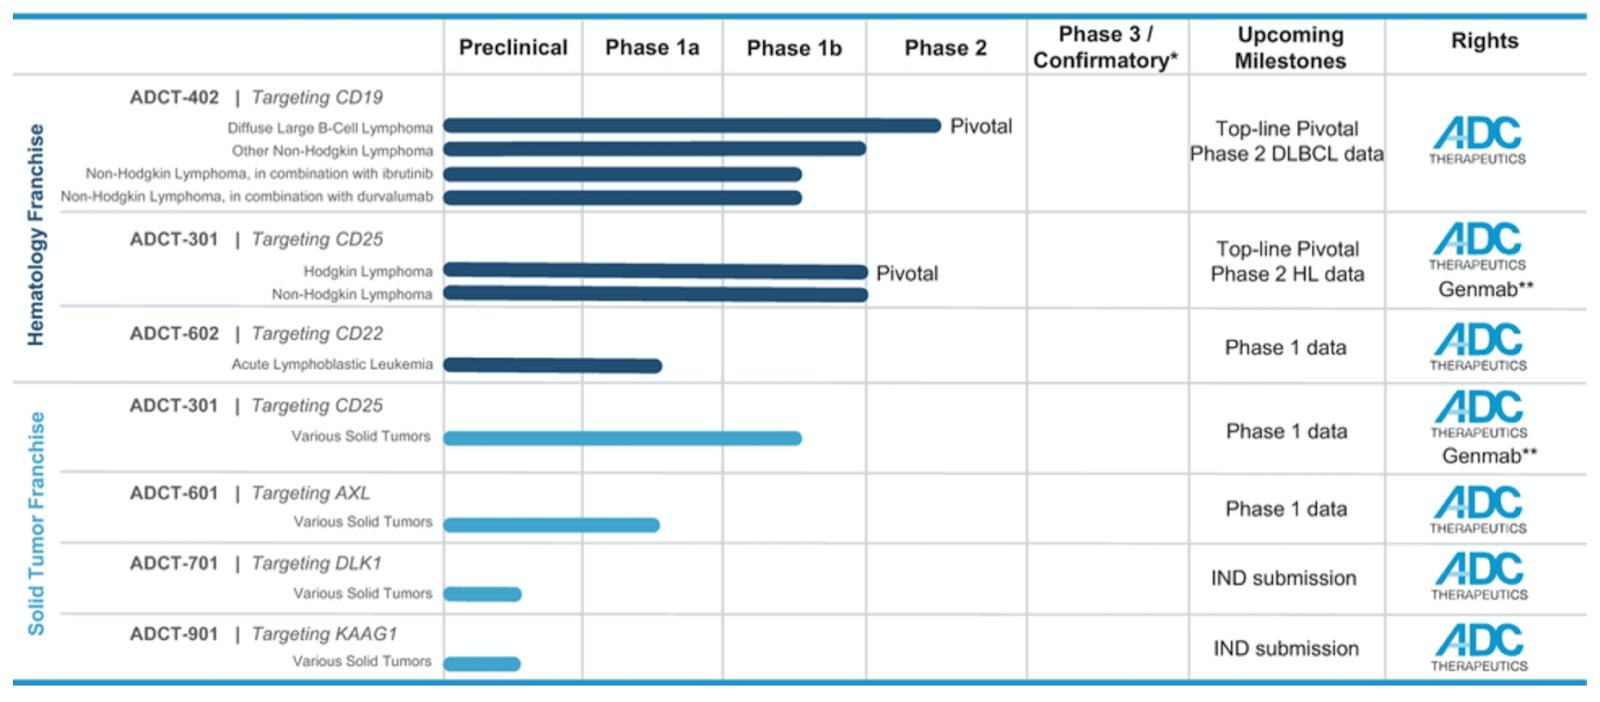 ADC Therapeutics Begins U.S. IPO Process